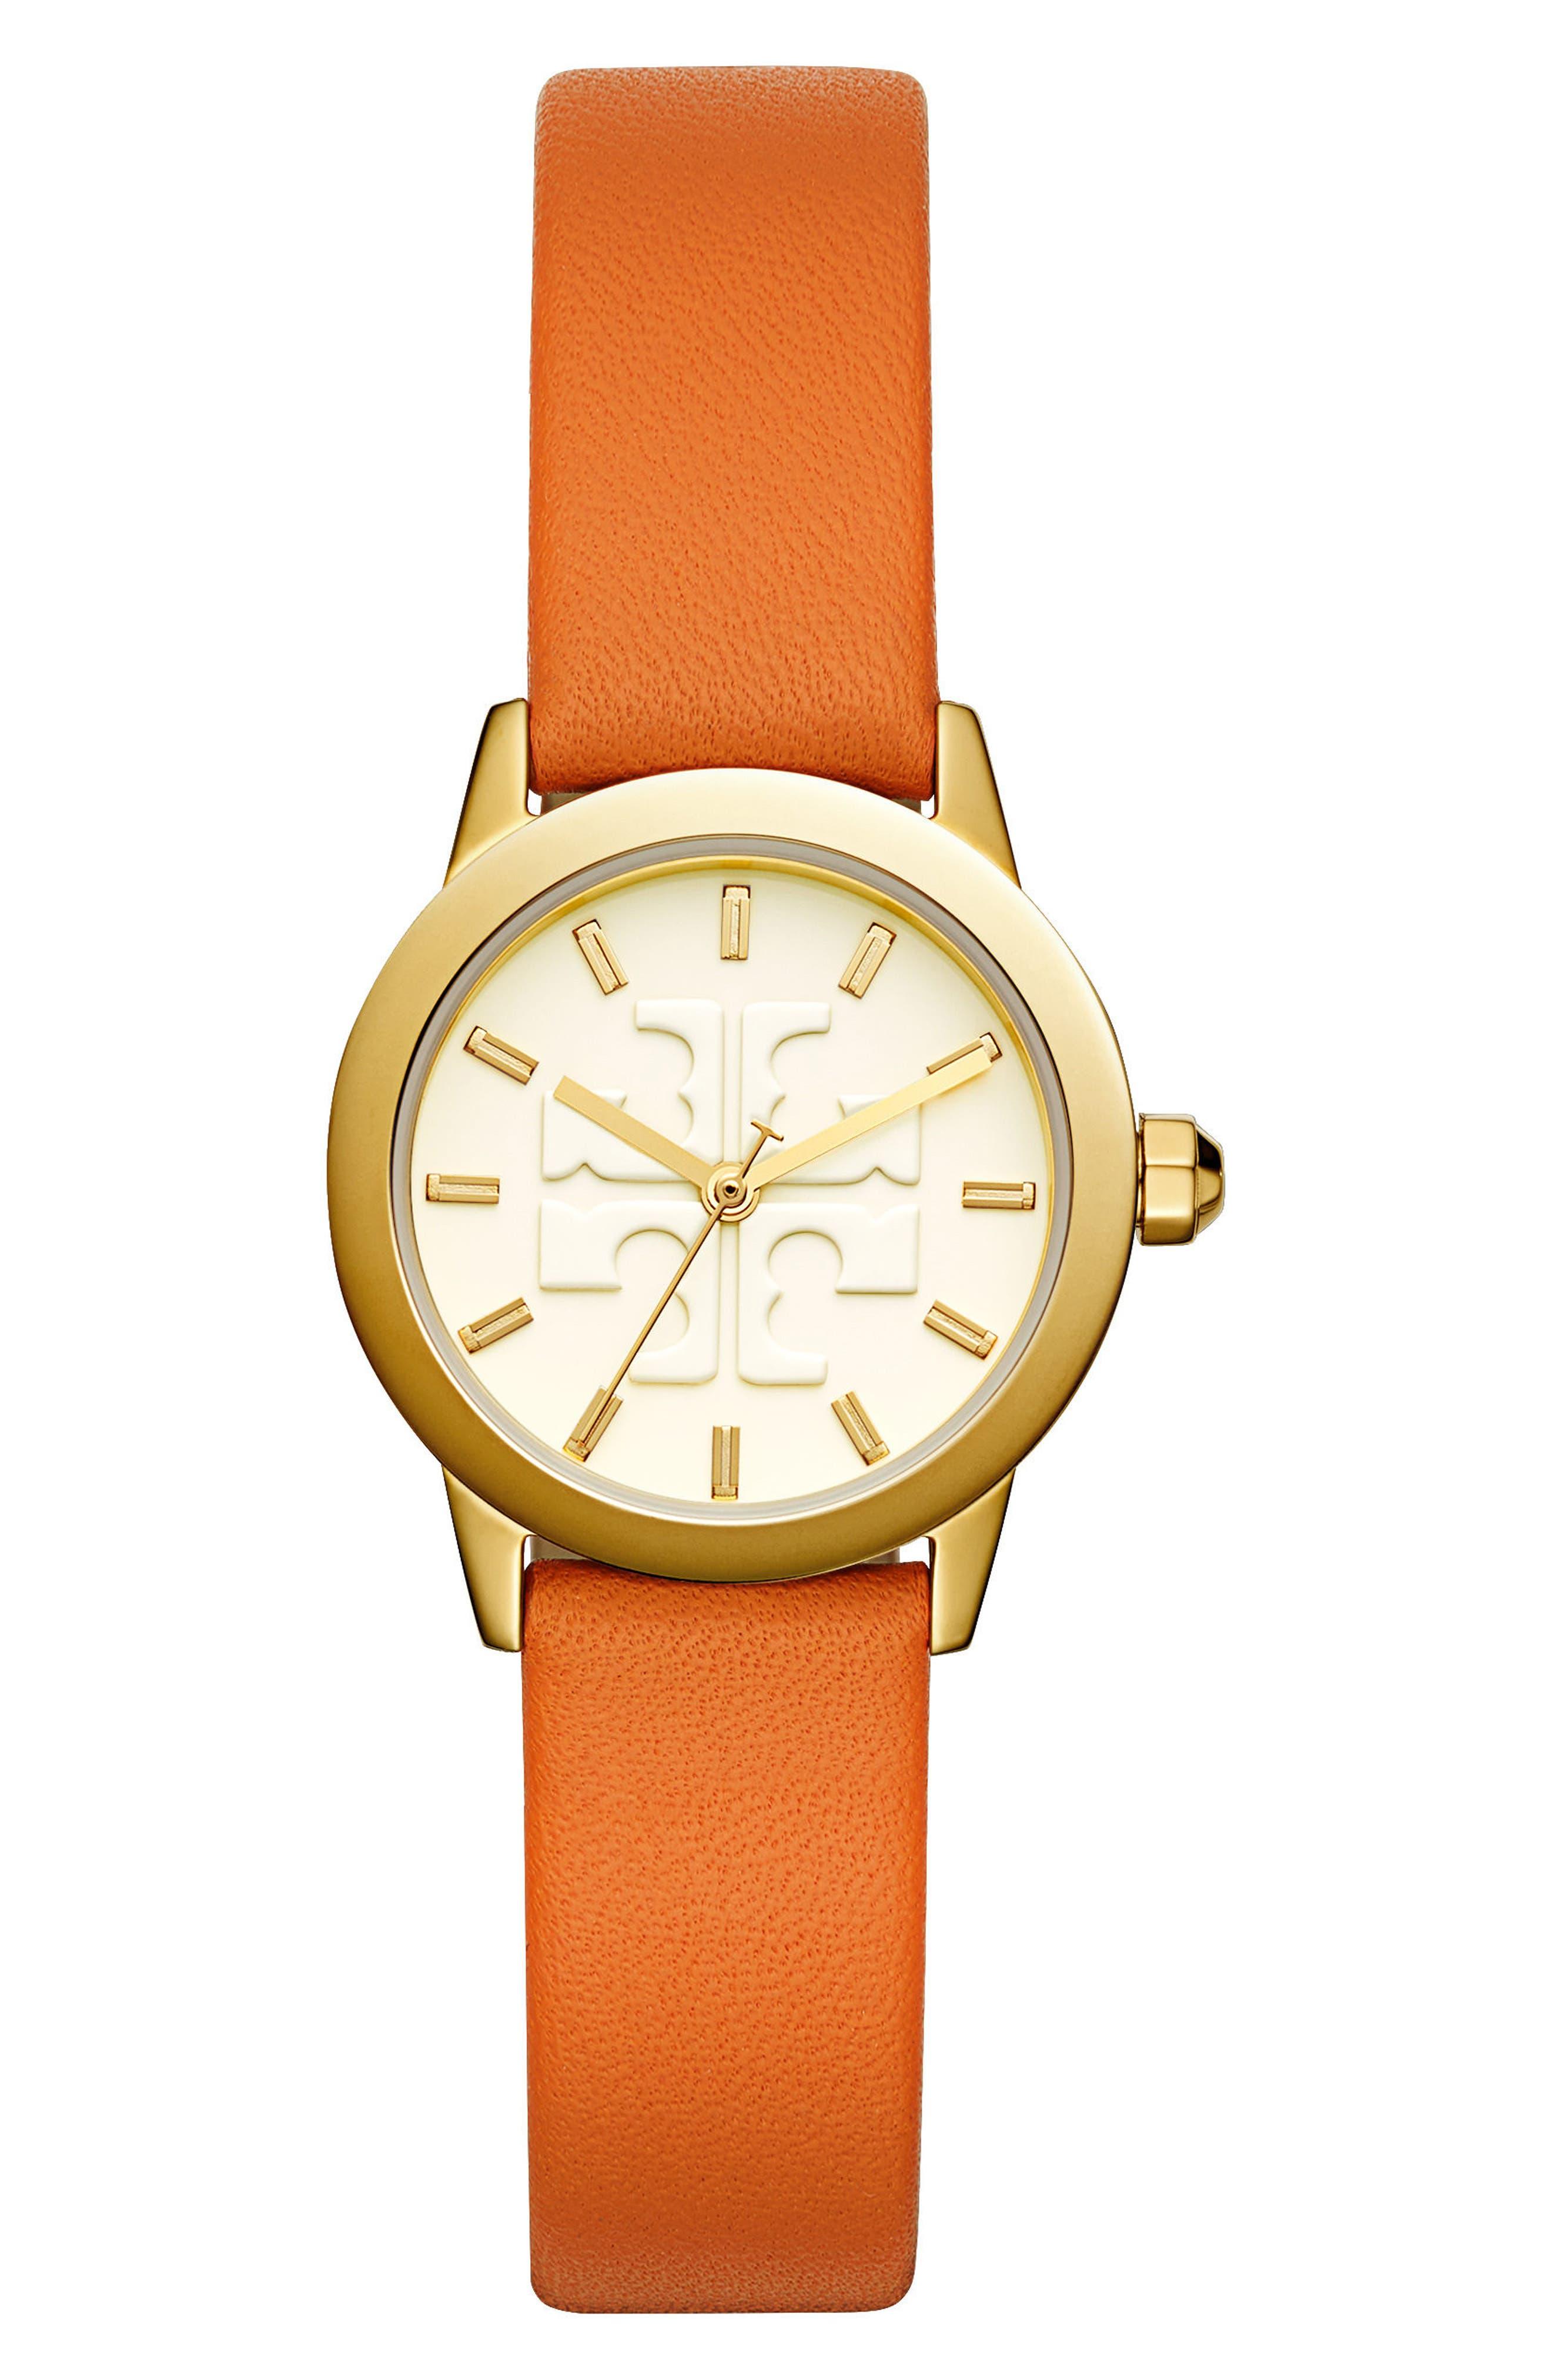 Main Image - Tory Burch Gigi Leather Strap Watch, 28mm